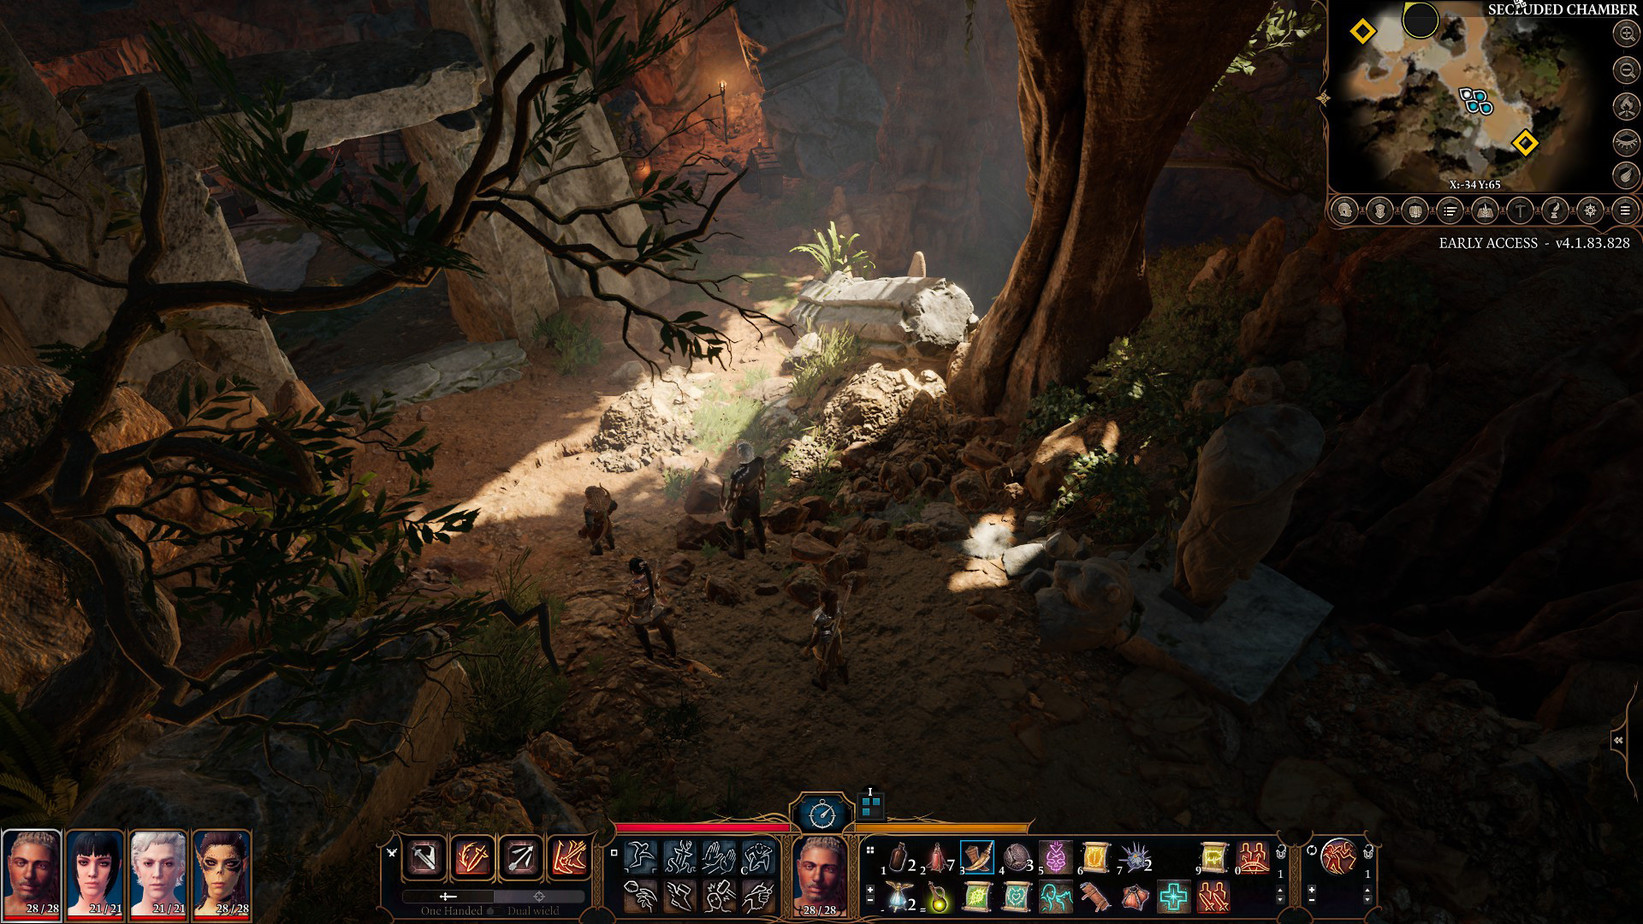 Baldur's Gate 3 Full Version